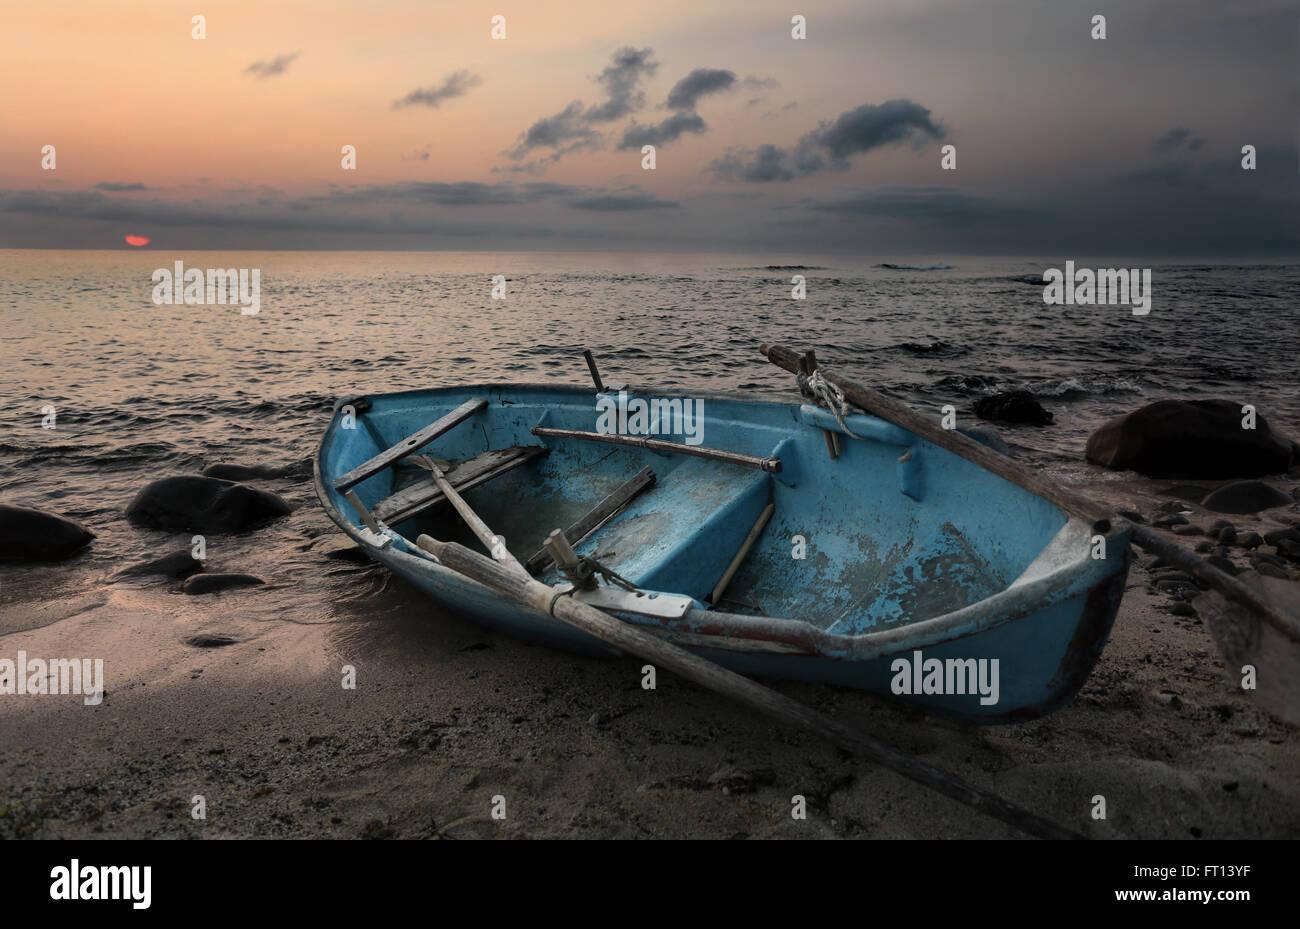 Fishing boat on a beach at sunset, Batan Island, Batanes, Philippines, Asia - Stock Image